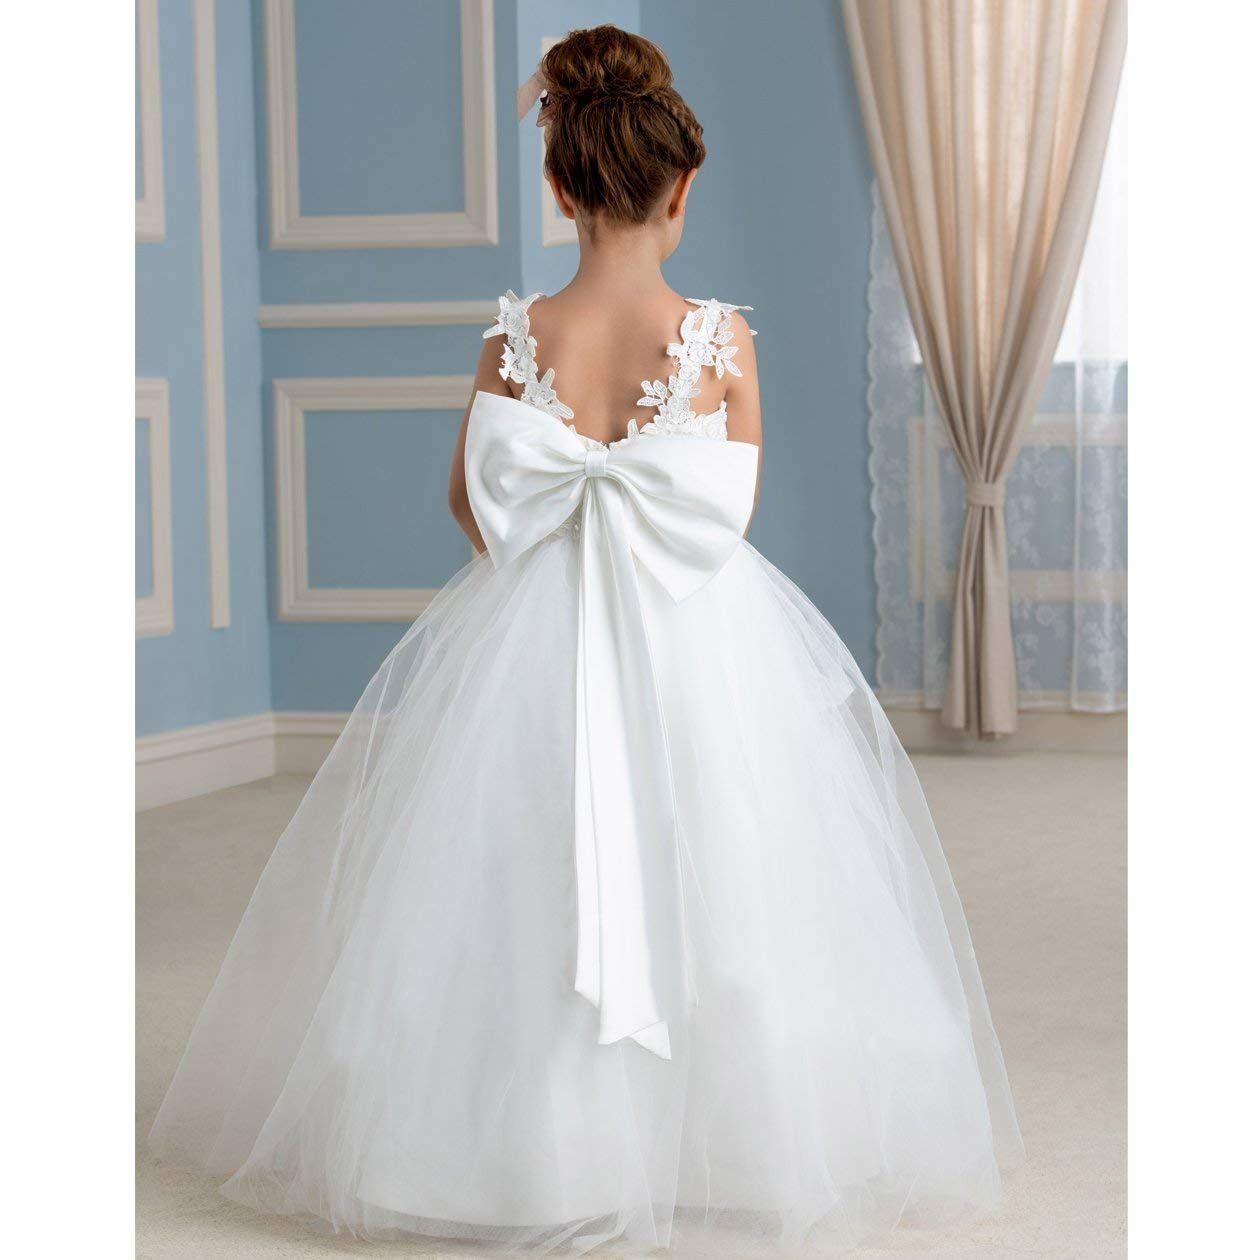 948f41582a4 New Girl Clothing Kids Dress Bear Puffy Toddler Children Dress Gown Flower  Girl Dresses Formal